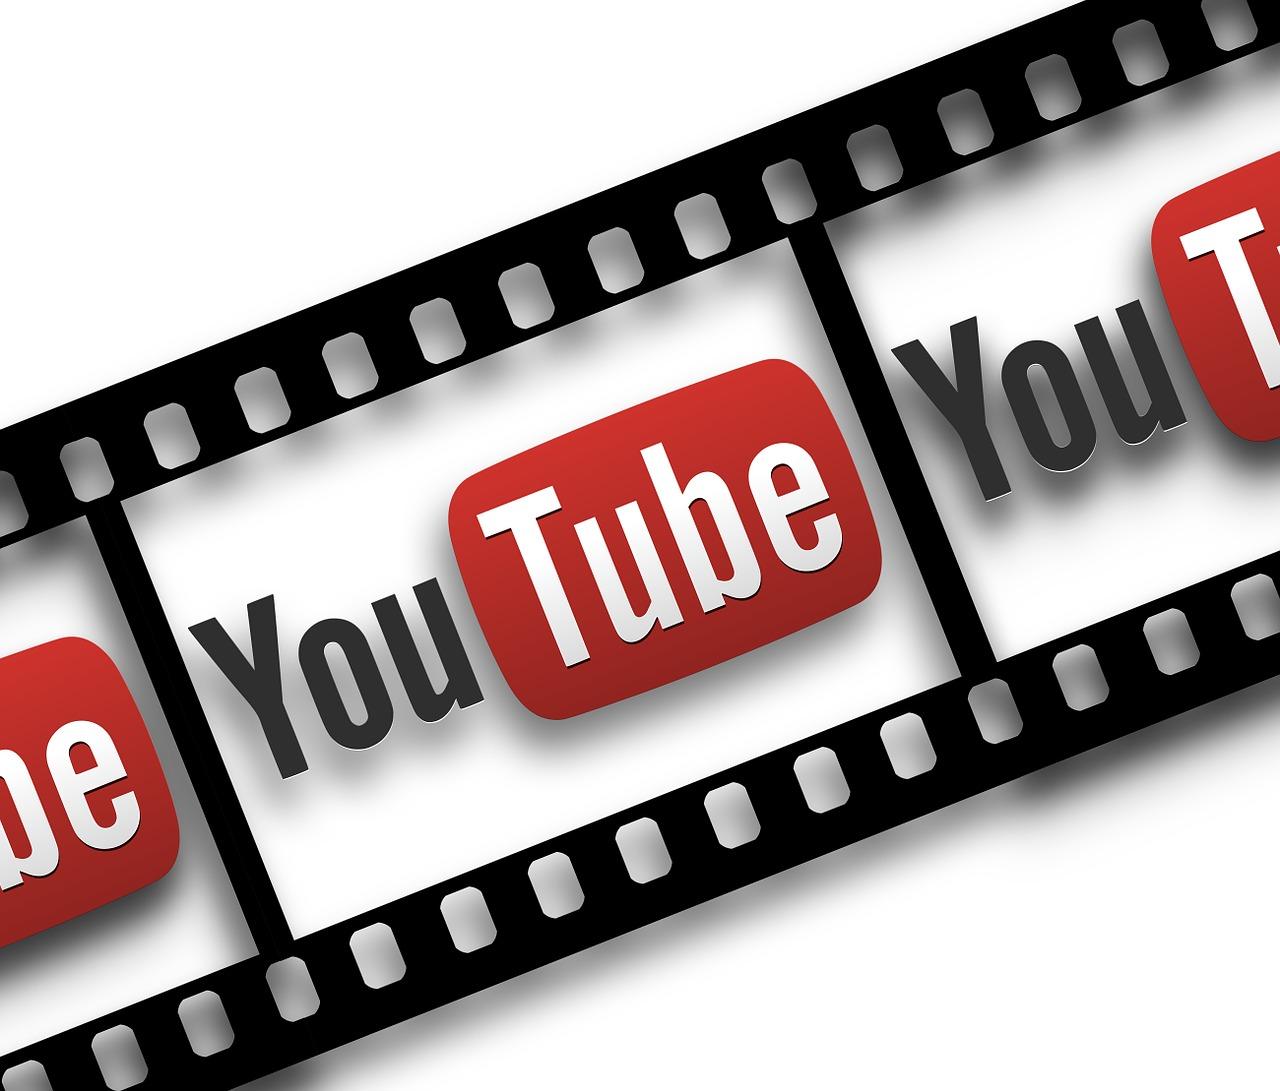 YouTube Premiumの登録・利用に最適なVPNはNordVPNで決まり?その理由を紹介!